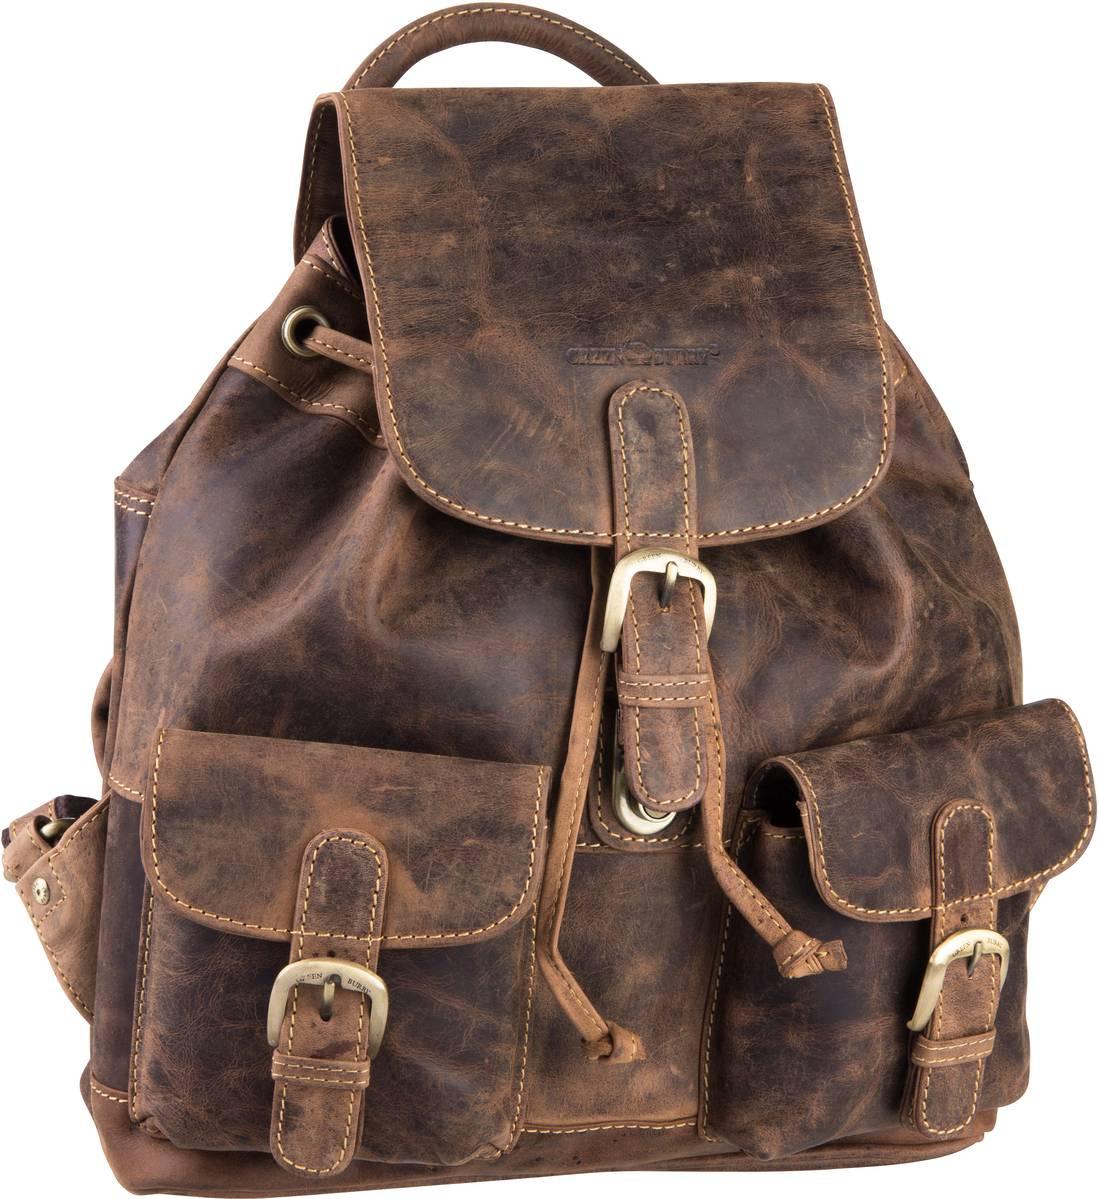 Rucksack / Daypack Vintage 1711M Rucksack medium Sattelbraun